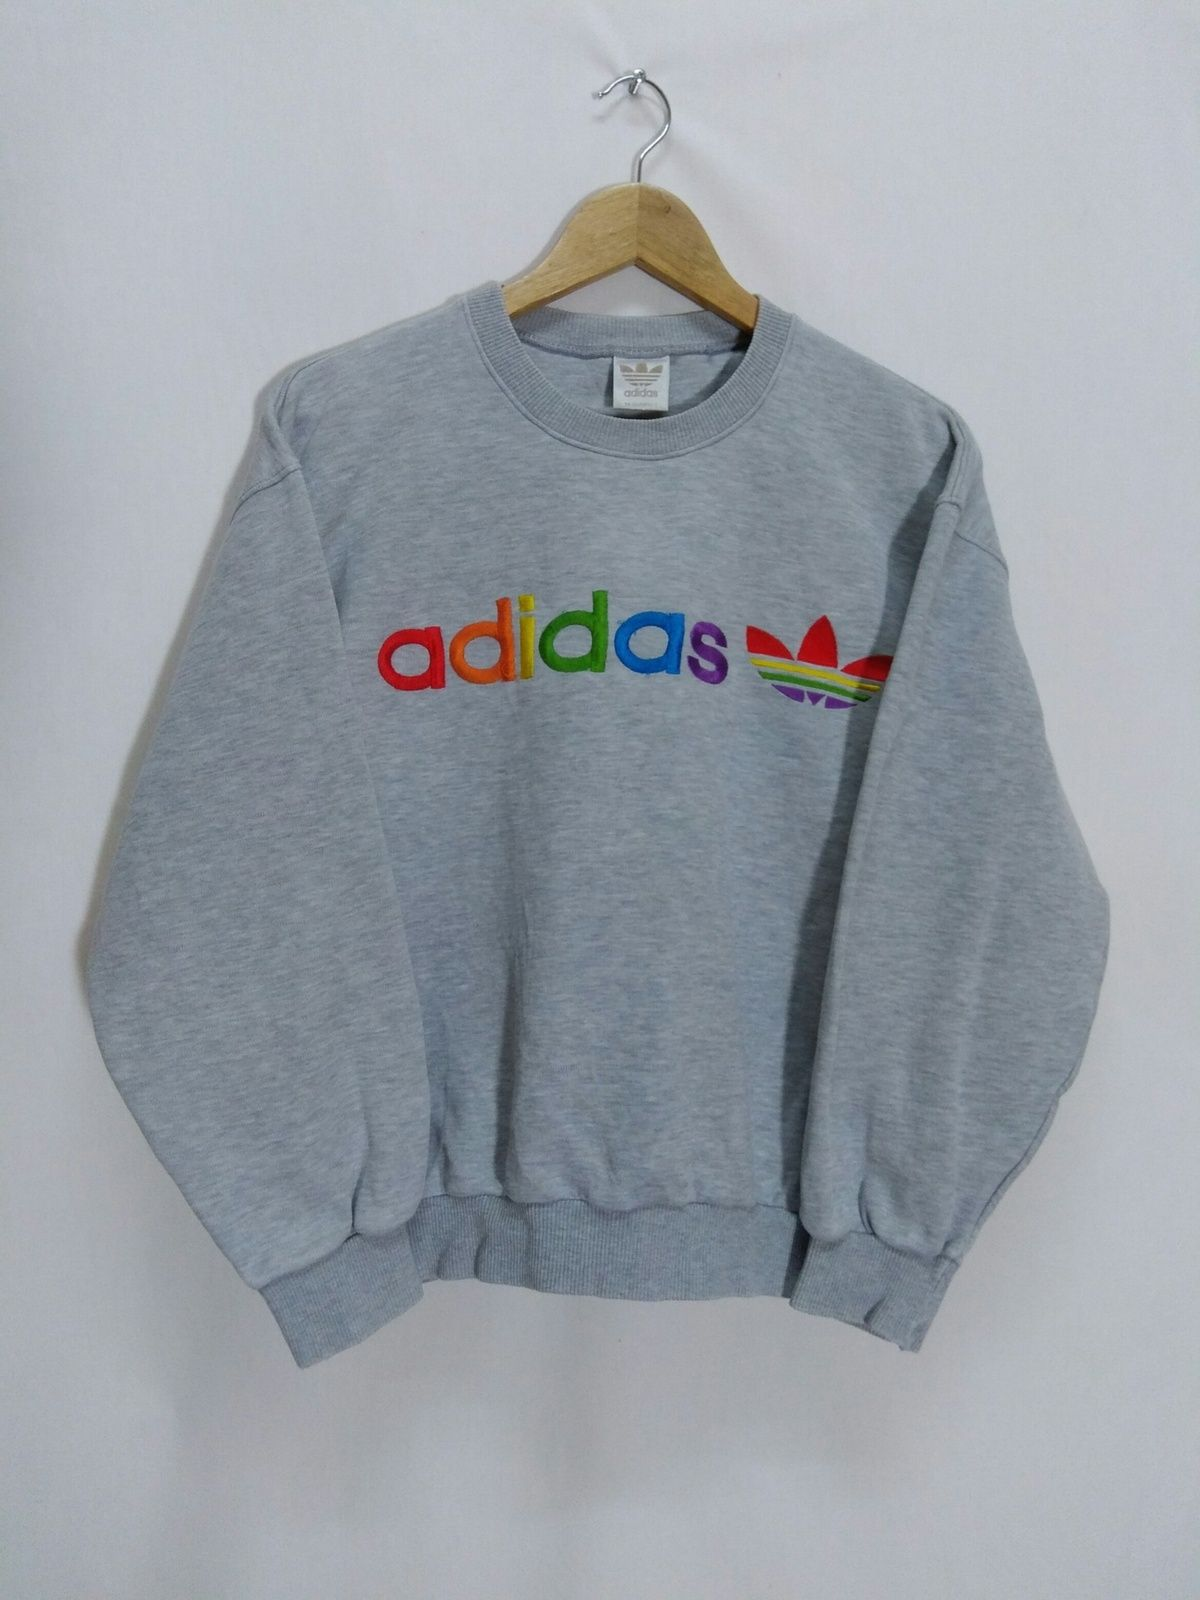 Buy Adidas Vintage Adidas Colorful Embroidered Sweatshirt Size L Description Tag Brand Adidas Size L Embroidered Sweatshirts Sweatshirts Vintage Adidas [ 1600 x 1200 Pixel ]